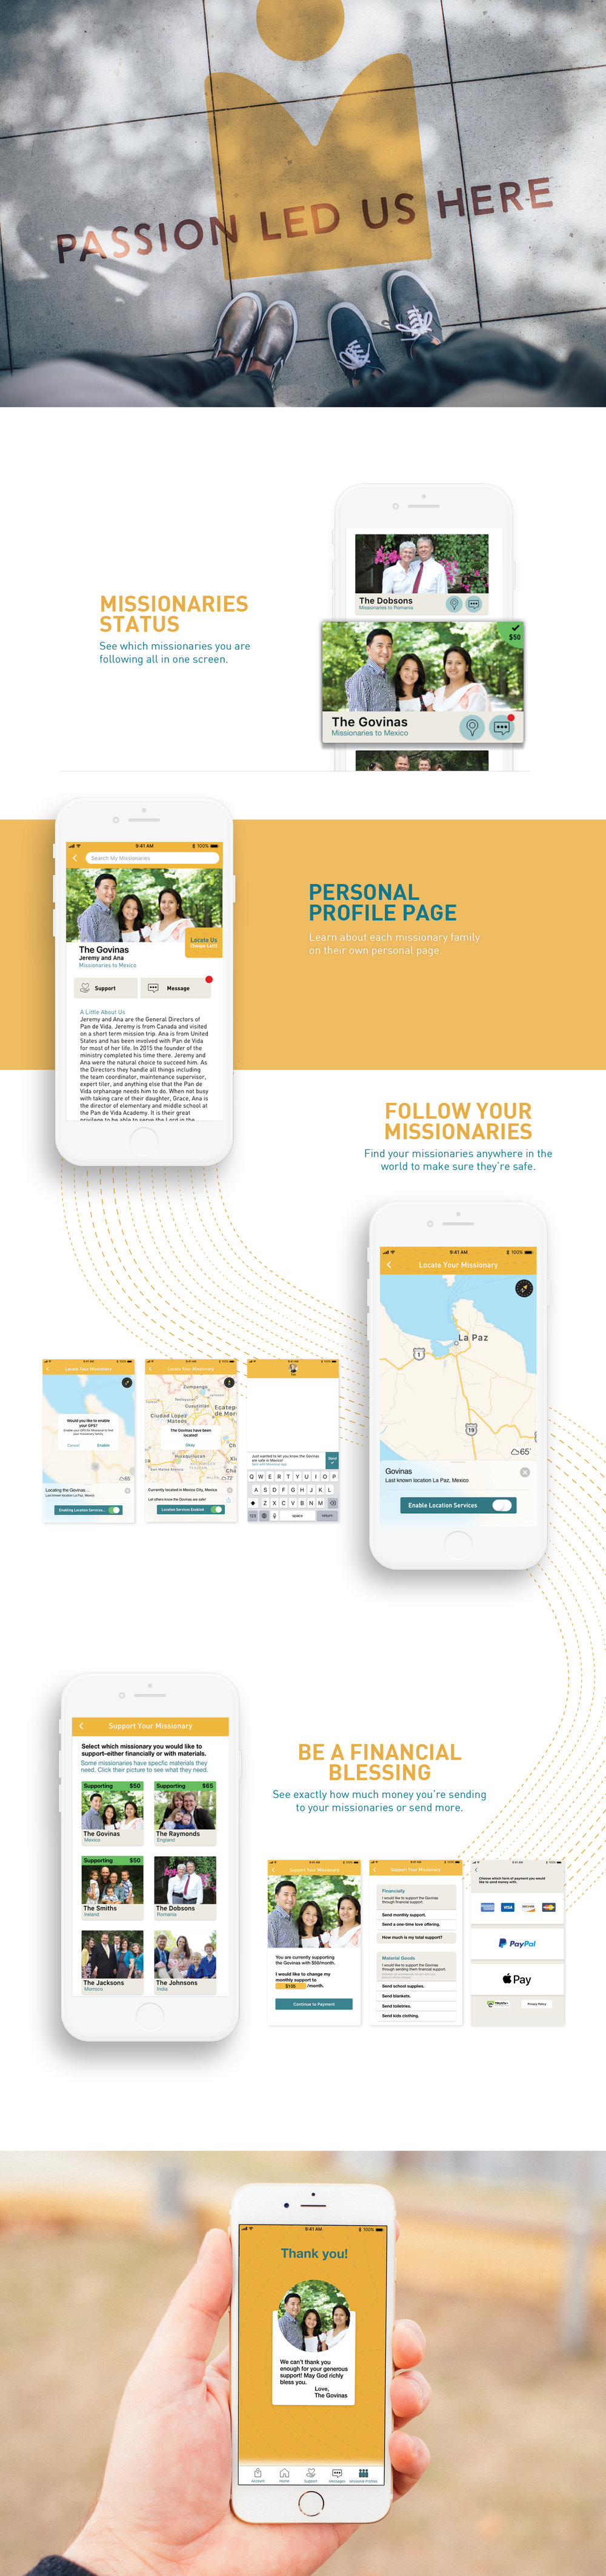 missional app.jpg